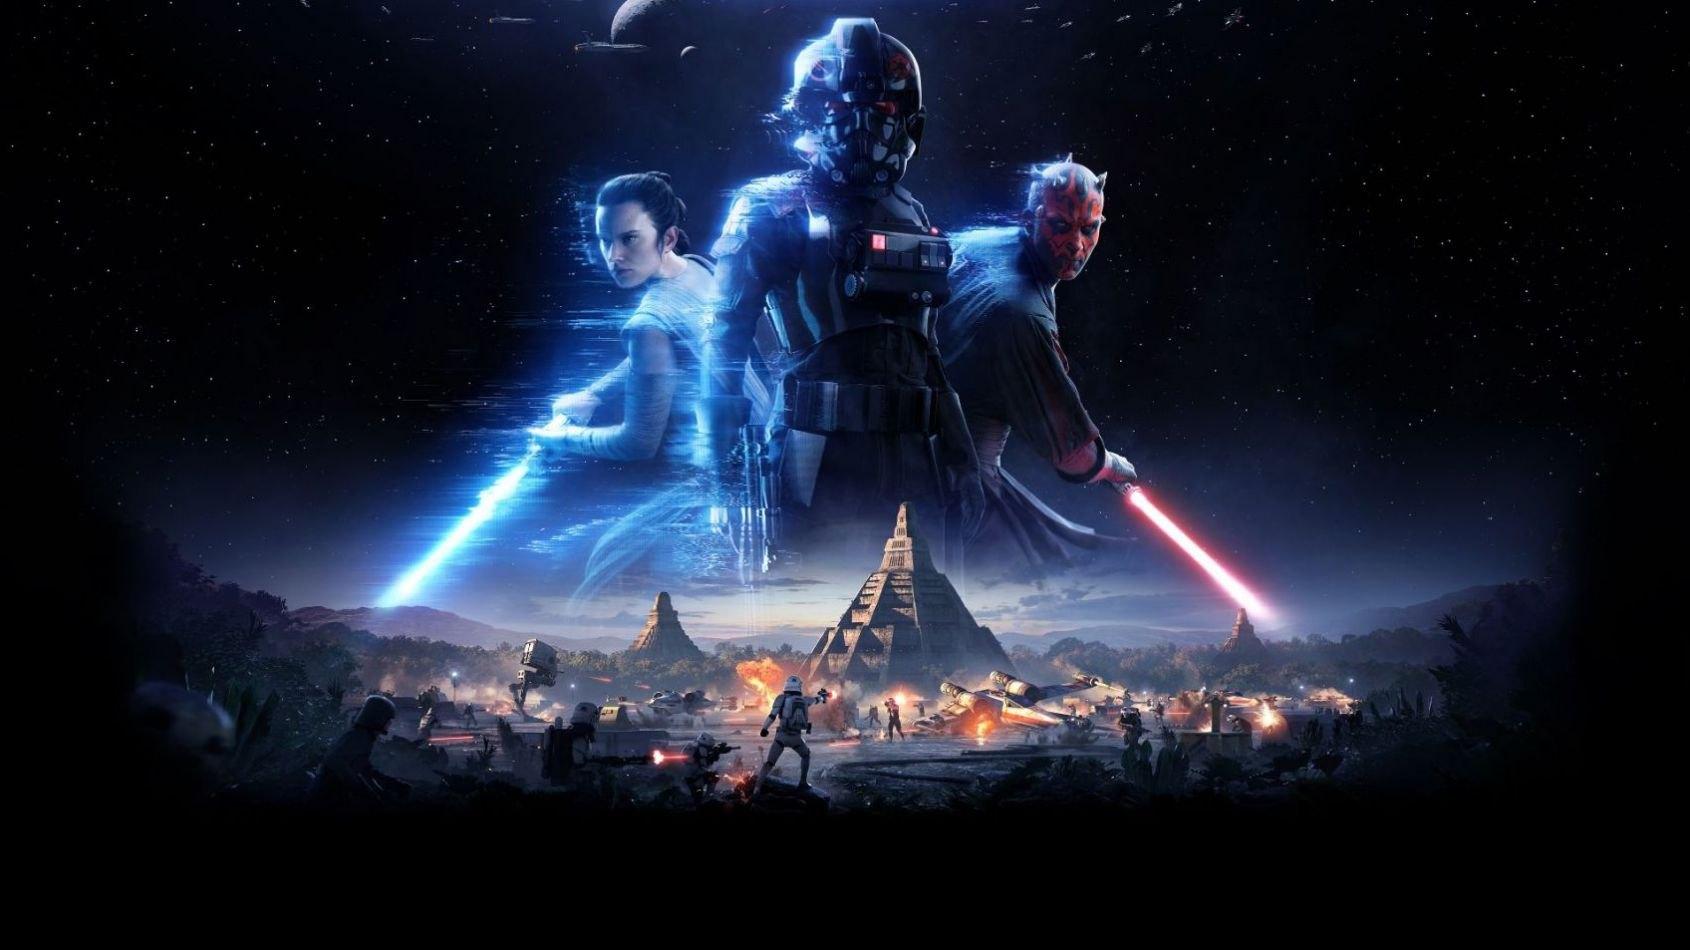 Star Wars Battlefront 2, enfin du gameplay dans l'espace — Gamescom